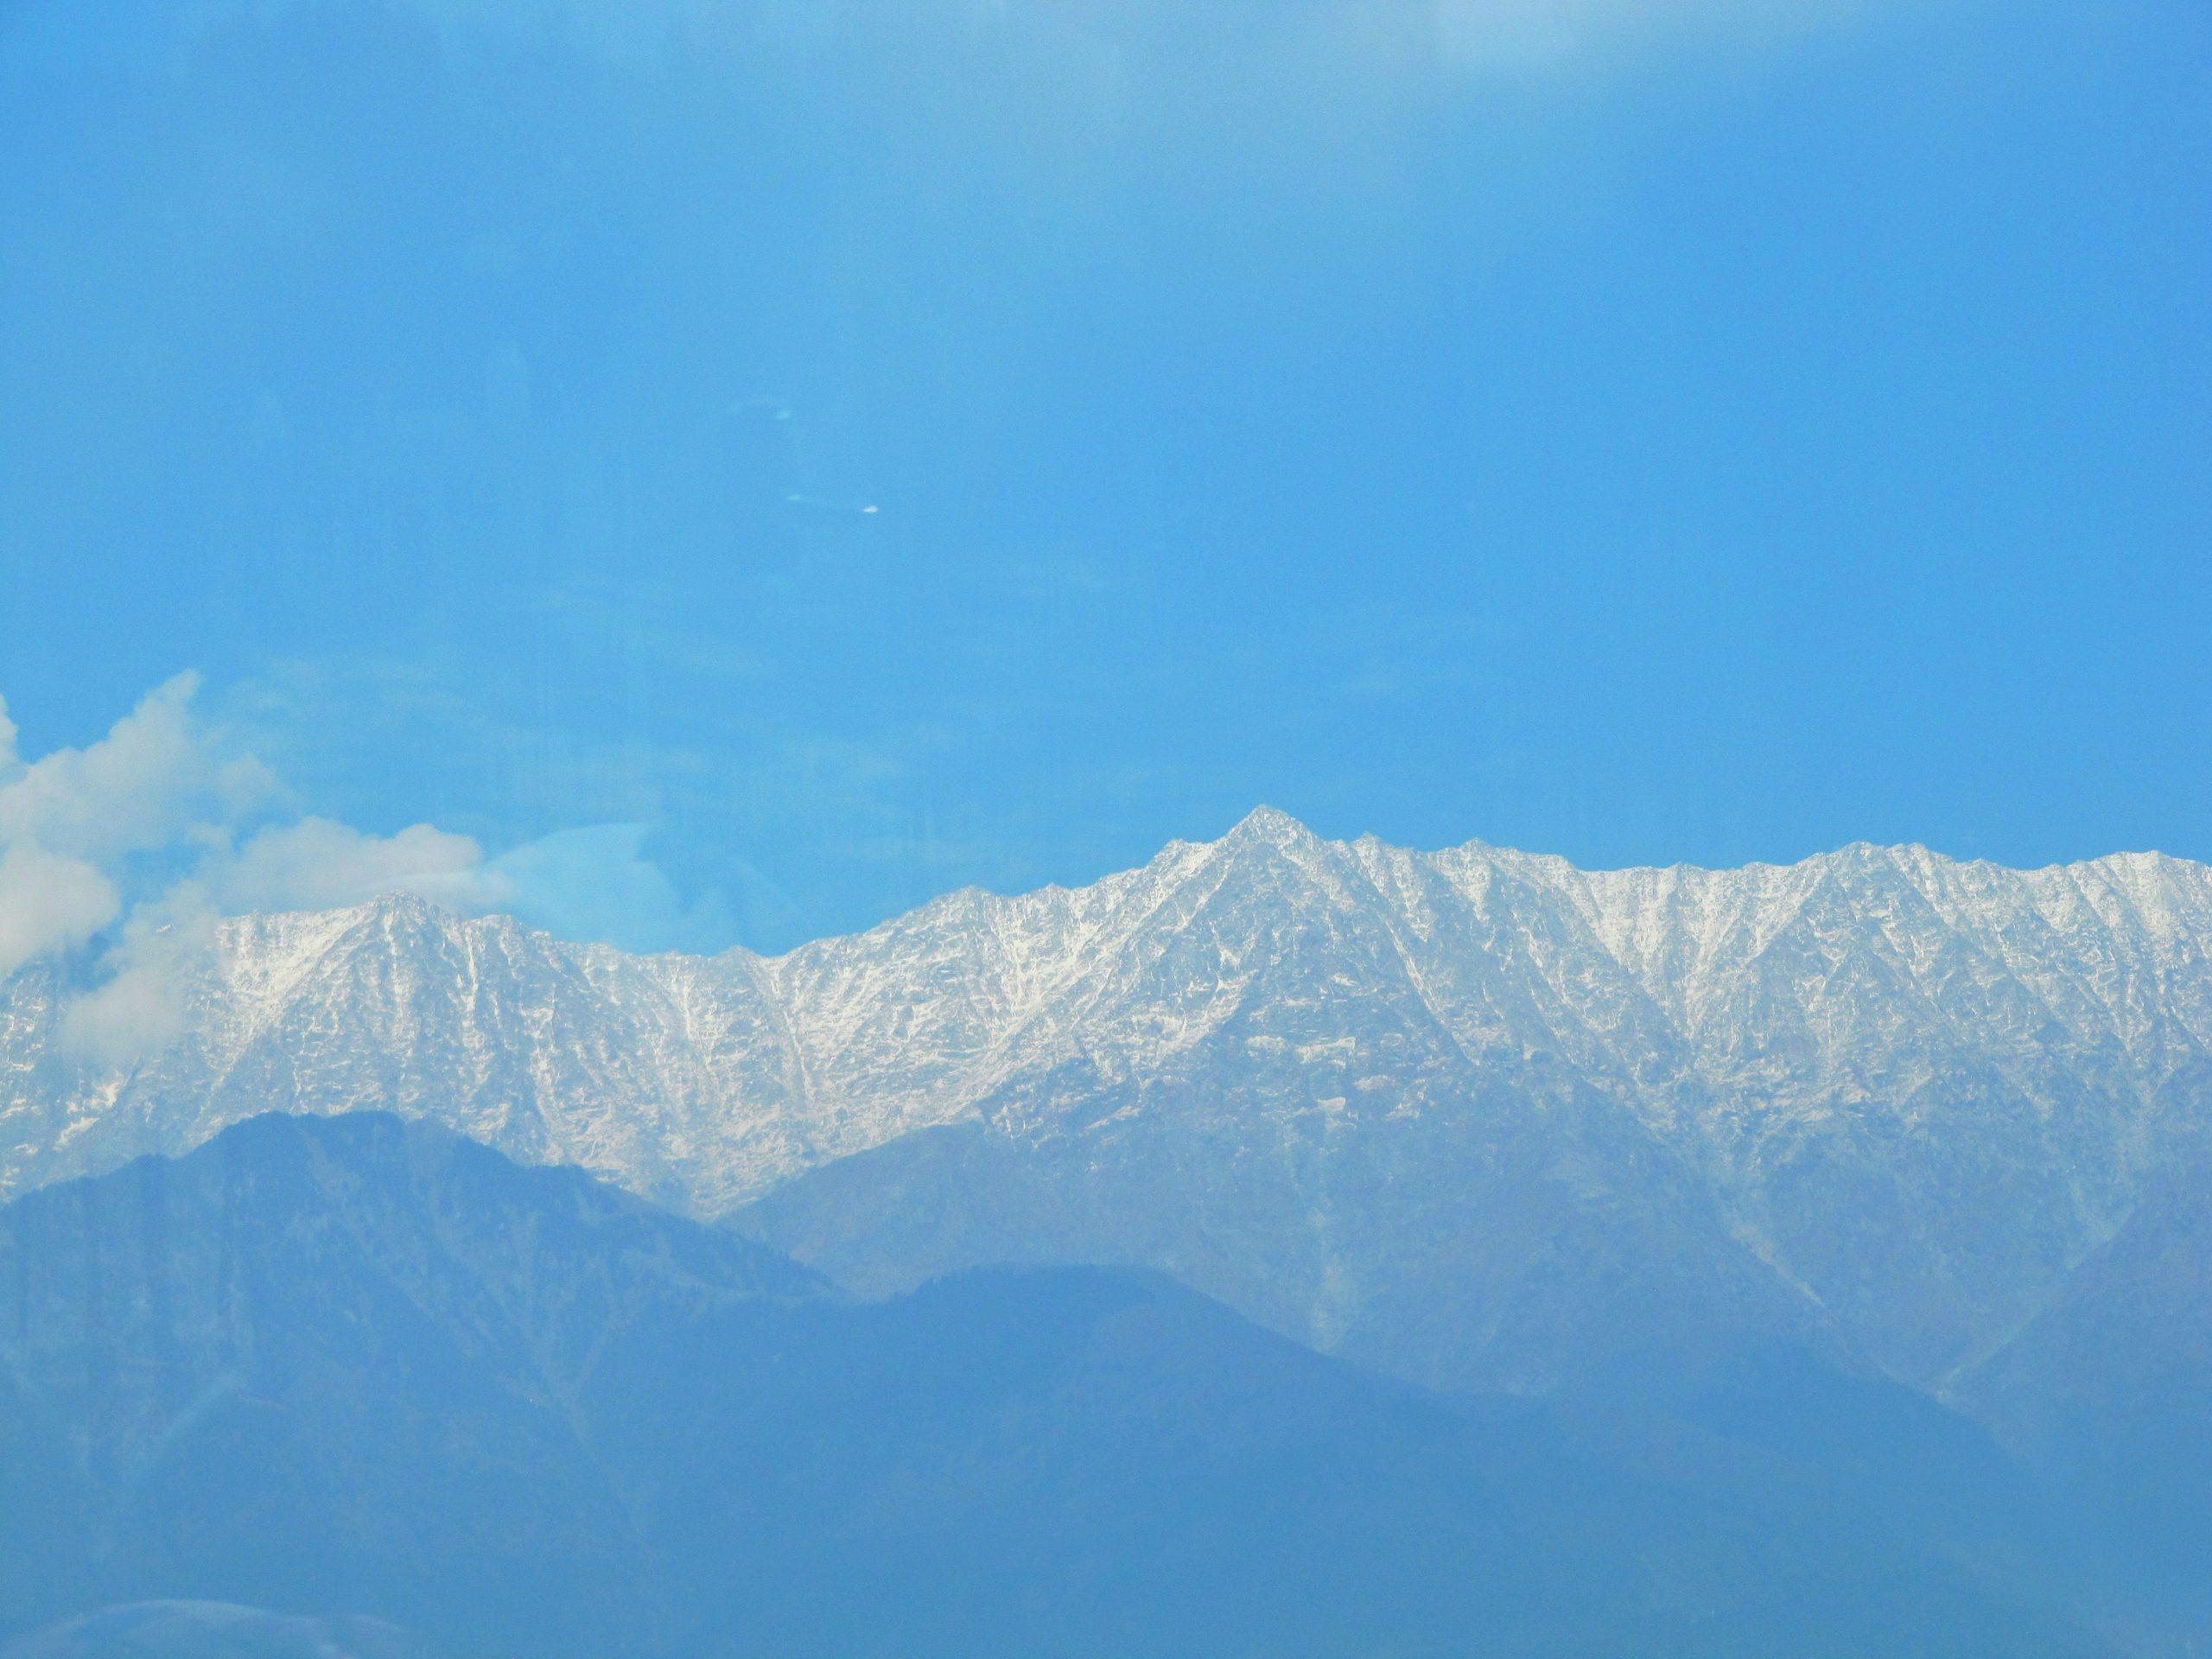 Mountain Range and Bright Sky